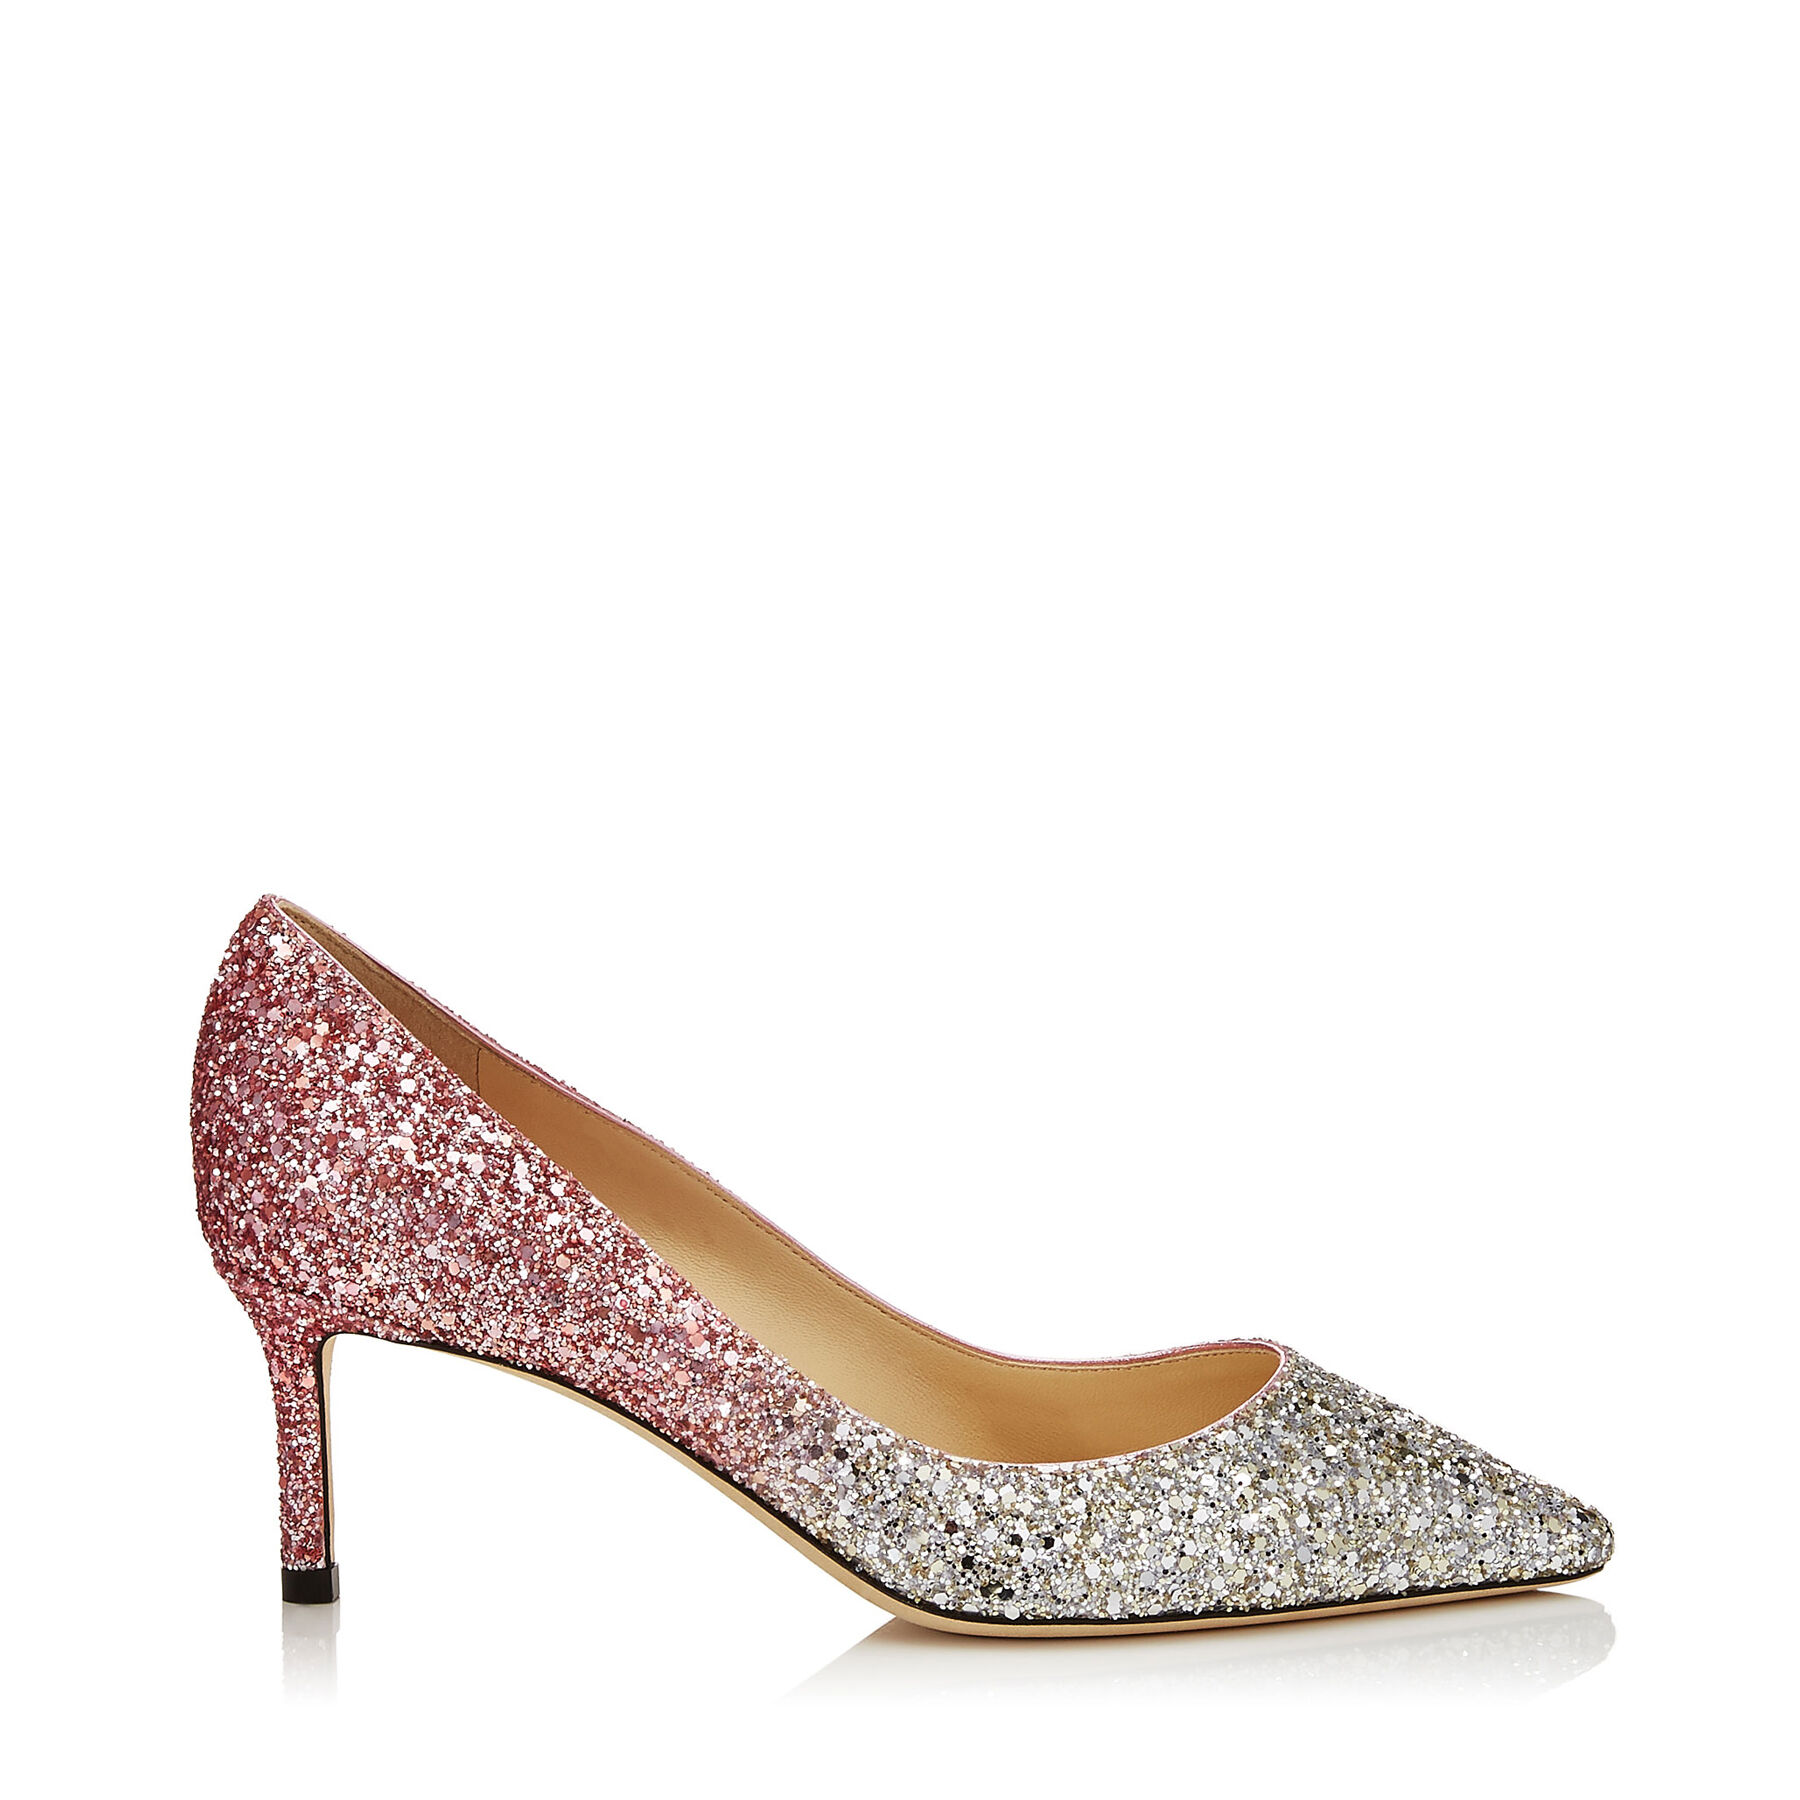 ROMY 60 粉色渐变亮片高跟鞋